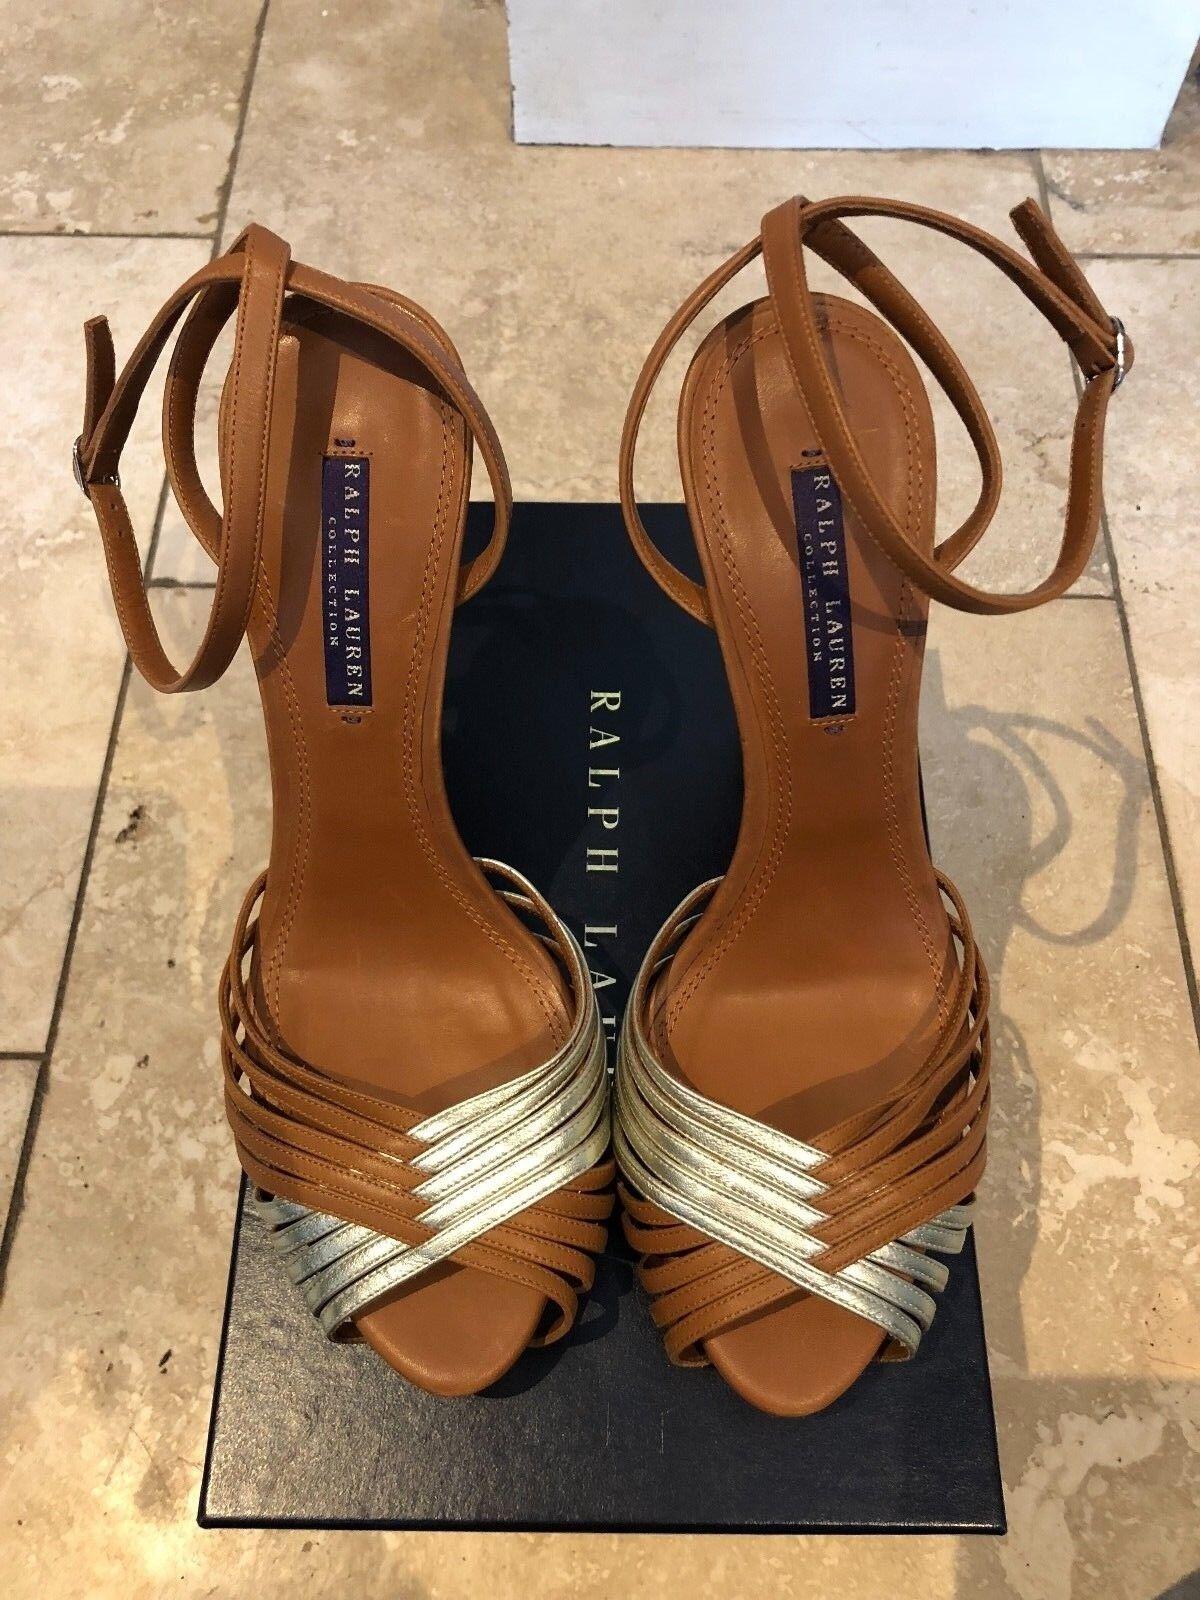 Ralph Lauren Collection Criss Cross Scarpe Sandalo in pelle marrone e argento tacco 10B